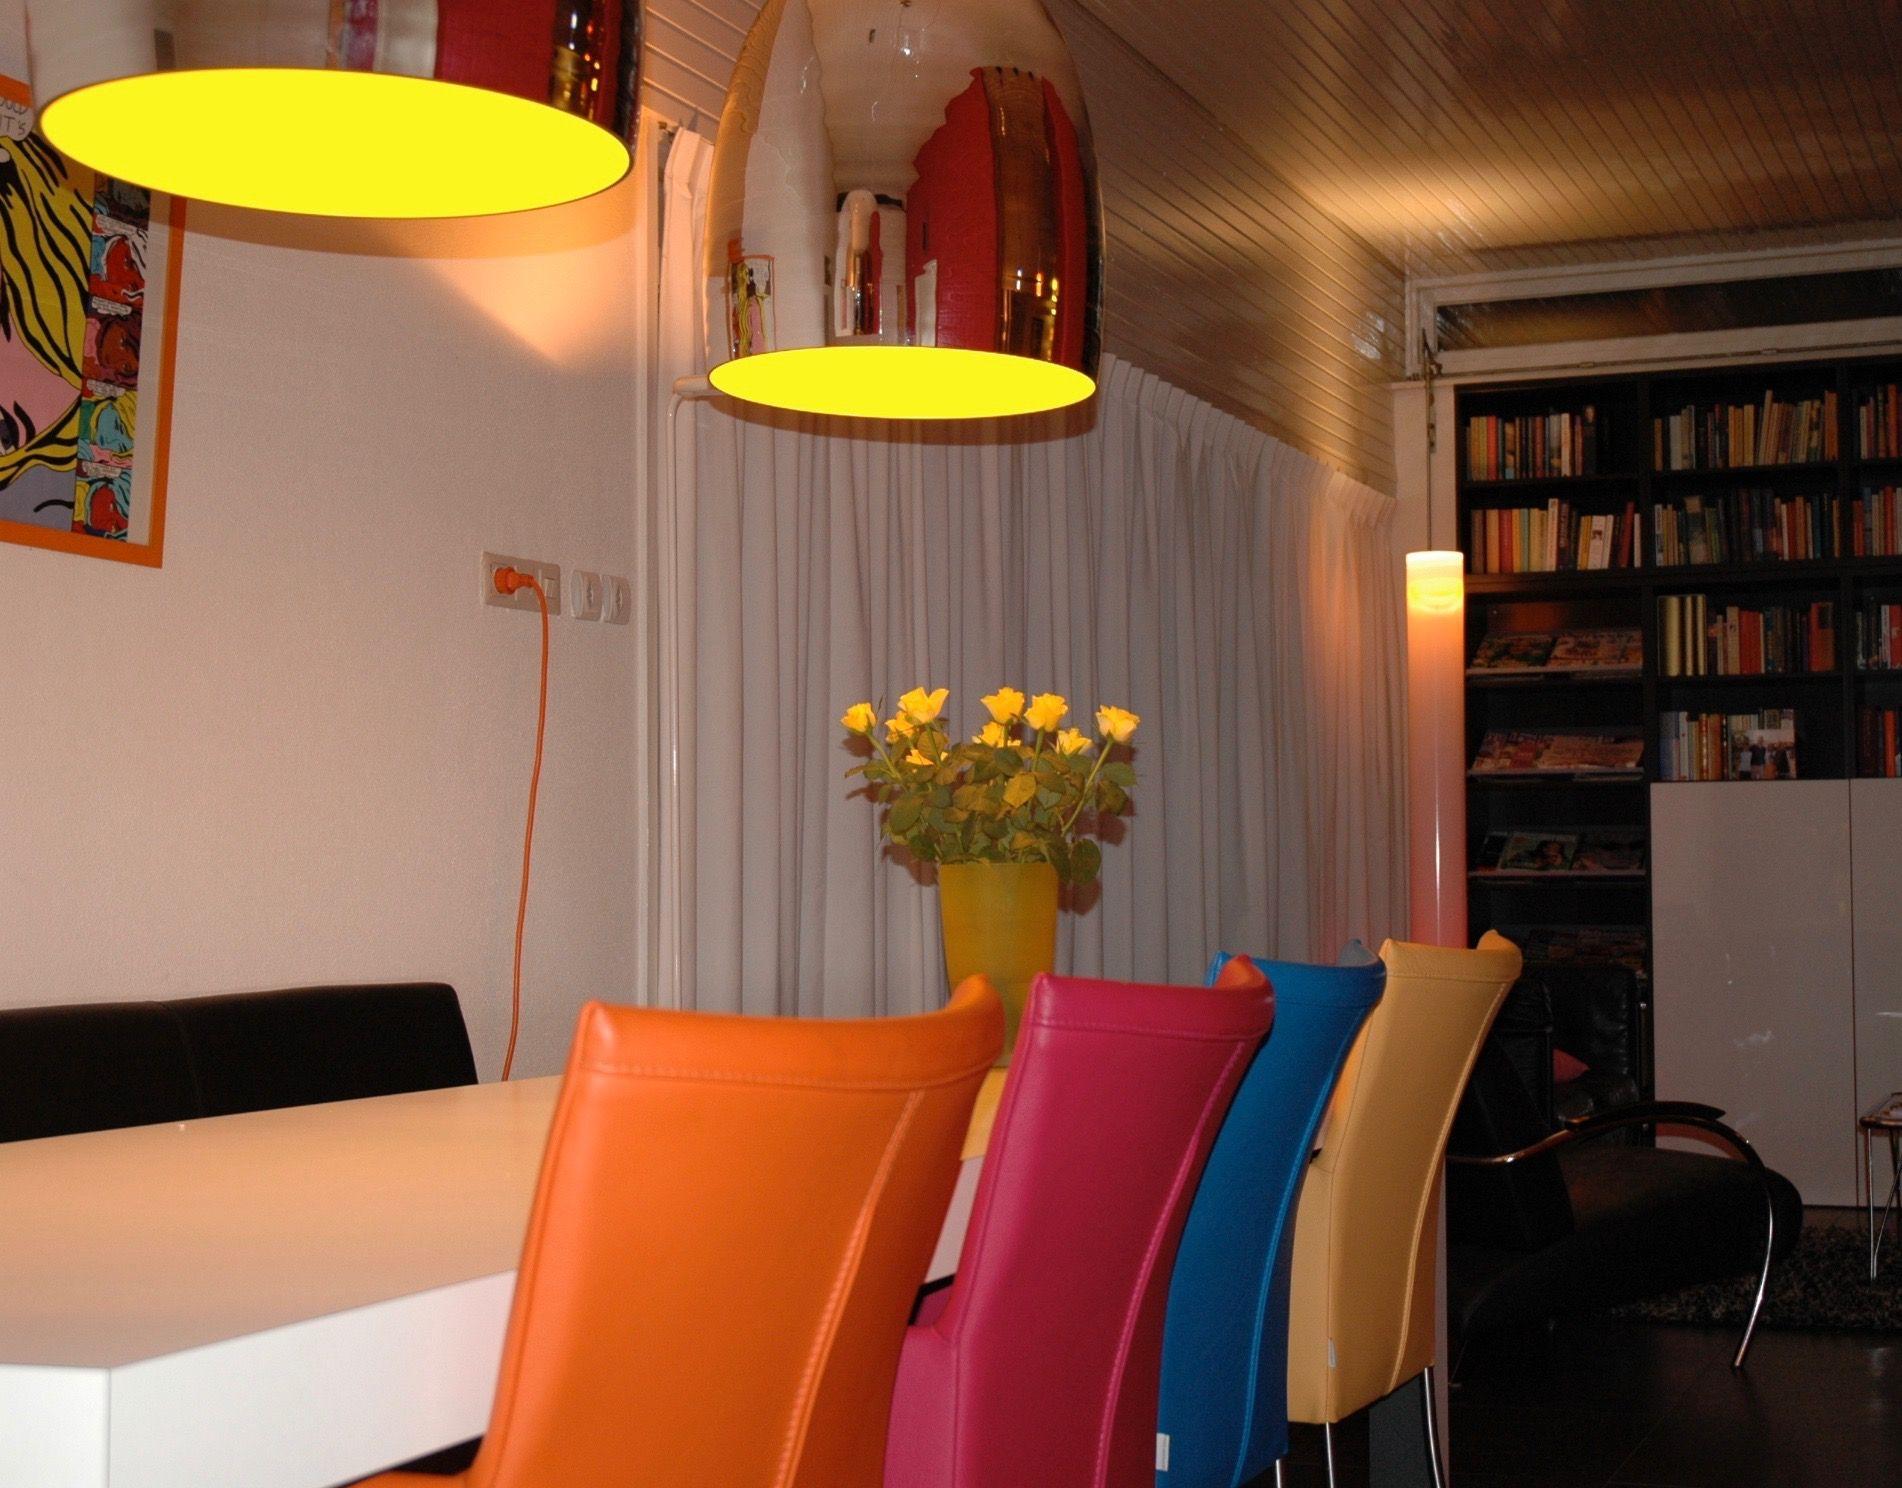 Interieurdesign lichtplan eetkamer interieurontwerp design